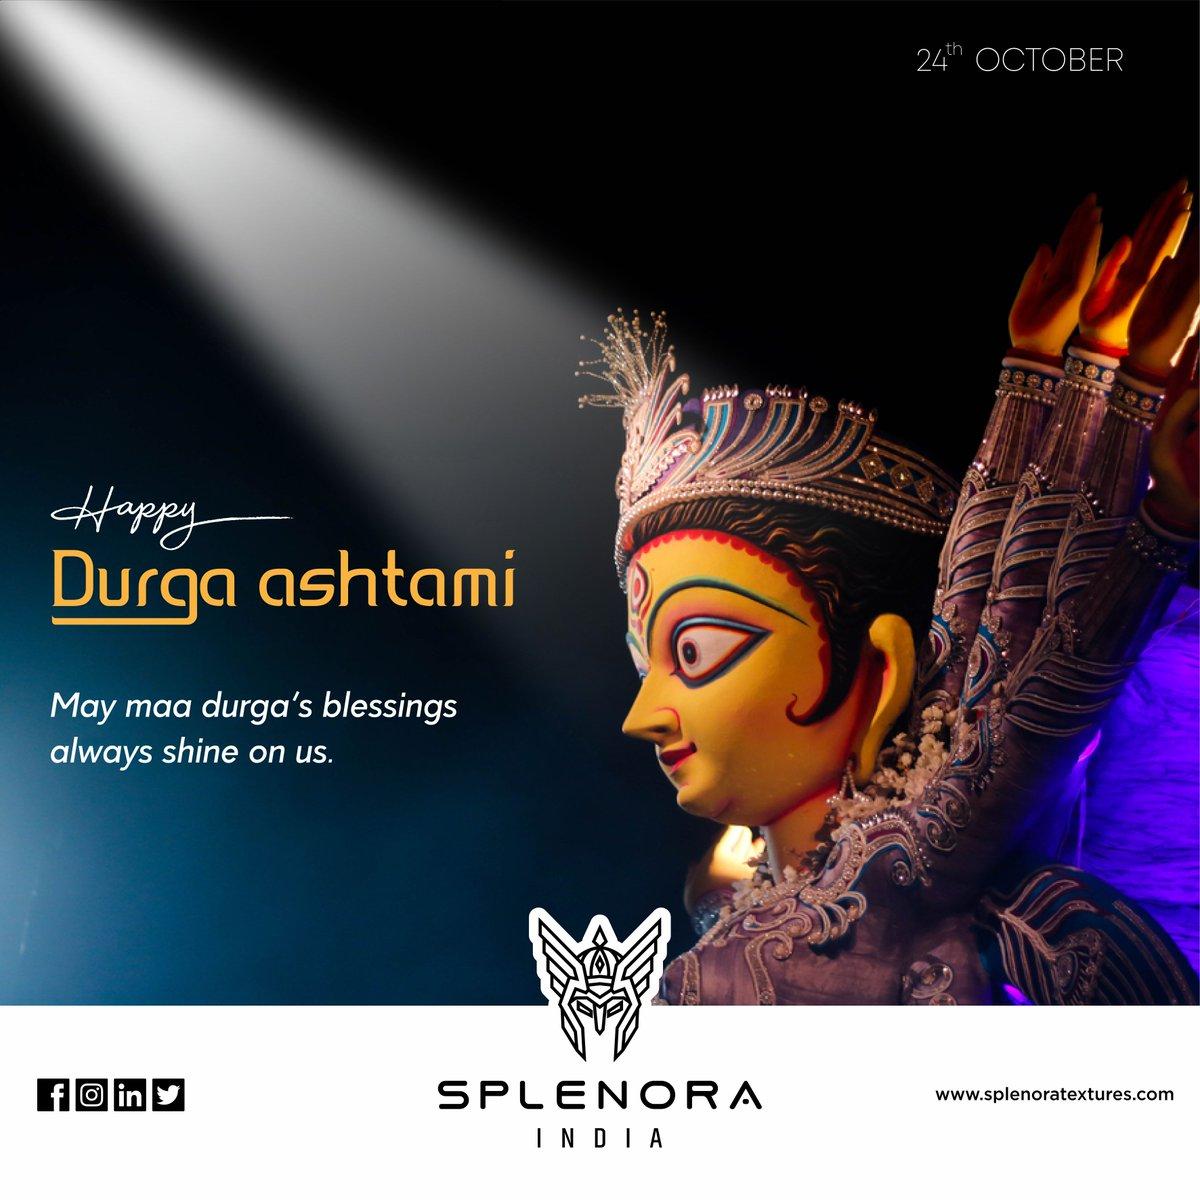 Durga Puja  #durgapuja #durga #navratri #maadurga #india #durgamaa #durgapujo #festival #festival #splenora #splenoraindia #textiles #industry #cloth #jeans #denim #febric #newcollection2020 #morbi #india https://t.co/kTGrMlfMAi